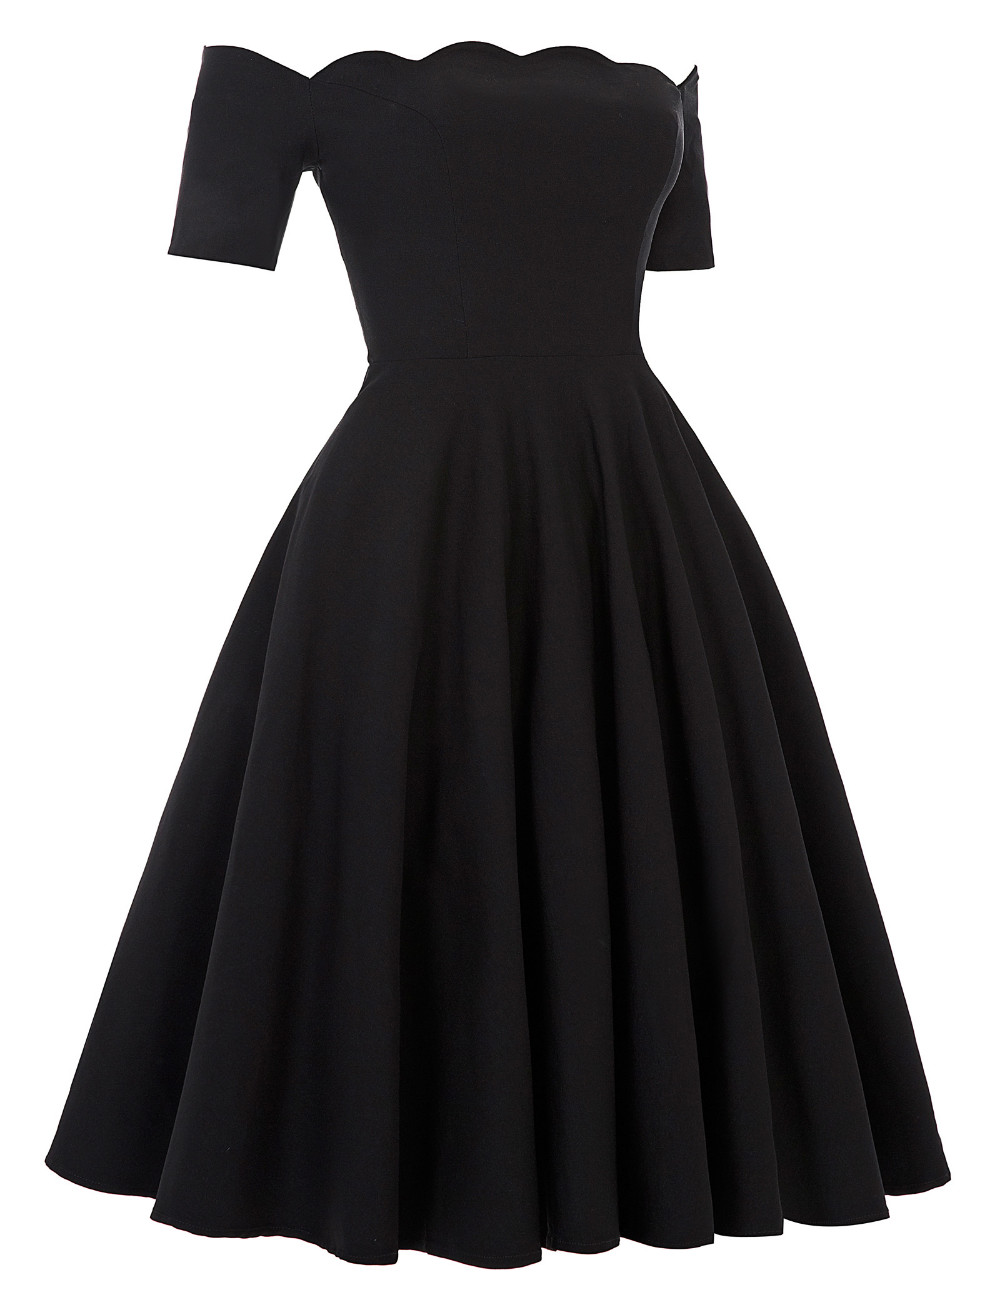 Belle Poque 17 Women Dress Robe Vintage Off Shoulder Black Summer Dress Jurken 1950s 60s Retro Rockabilly Swing Party Dresses 12